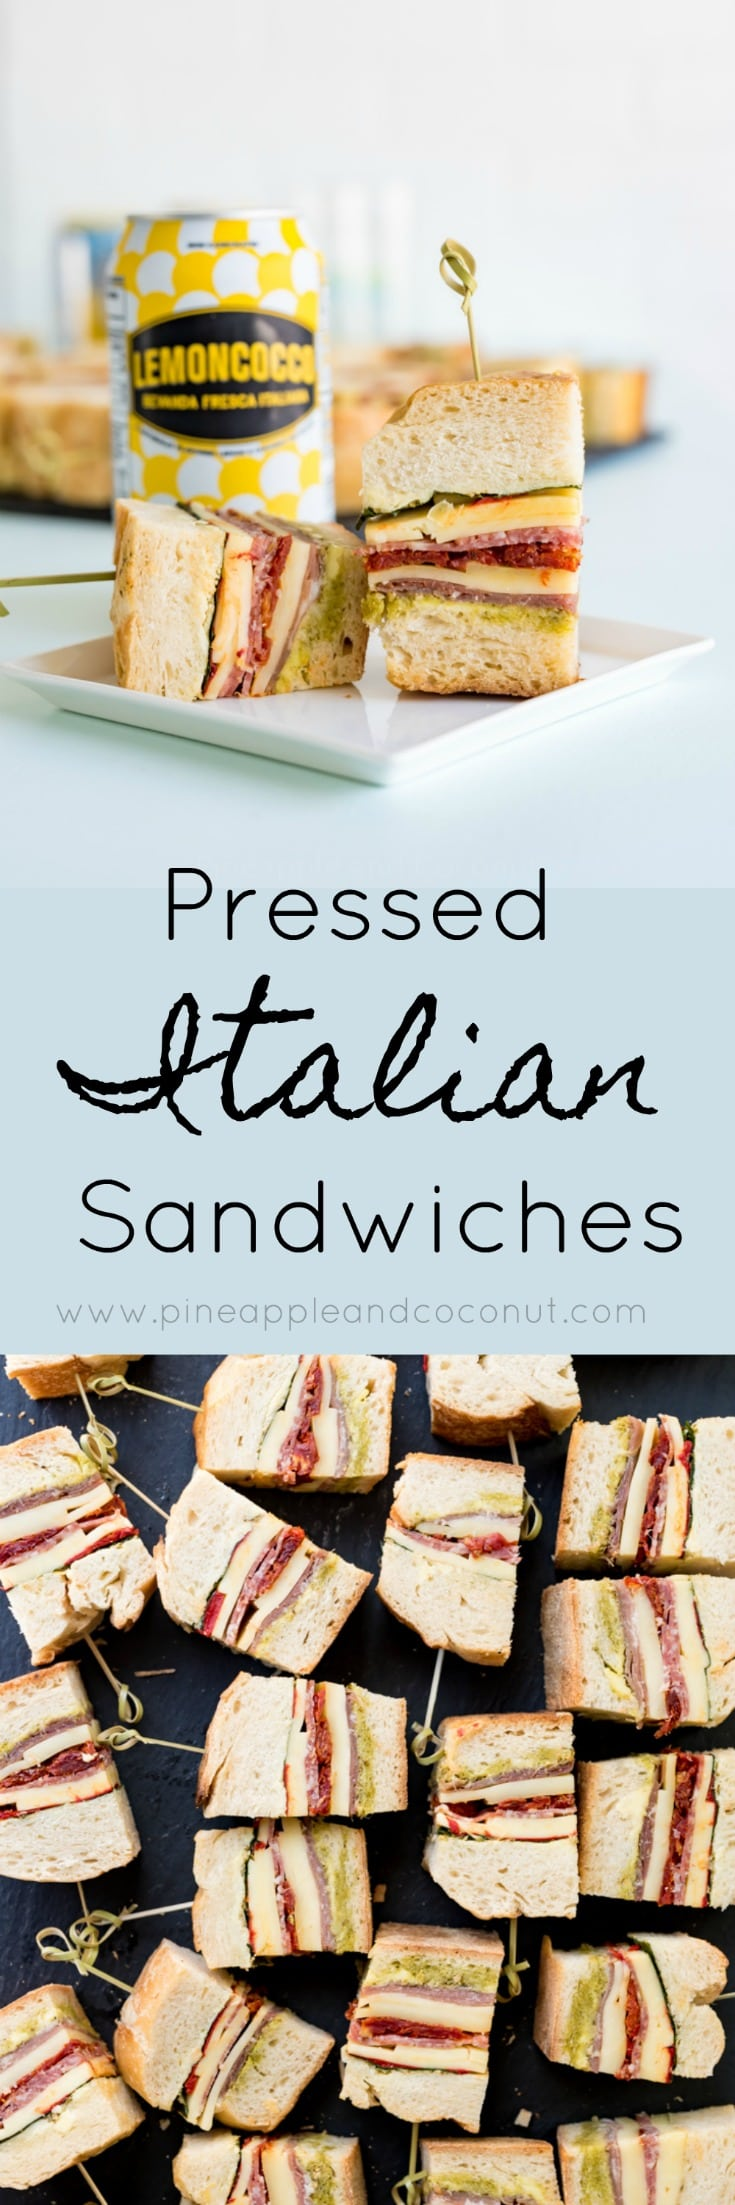 Pressed Italian Sandwiches www.pineappleandcoconut.com #ad #discoverworldmarket